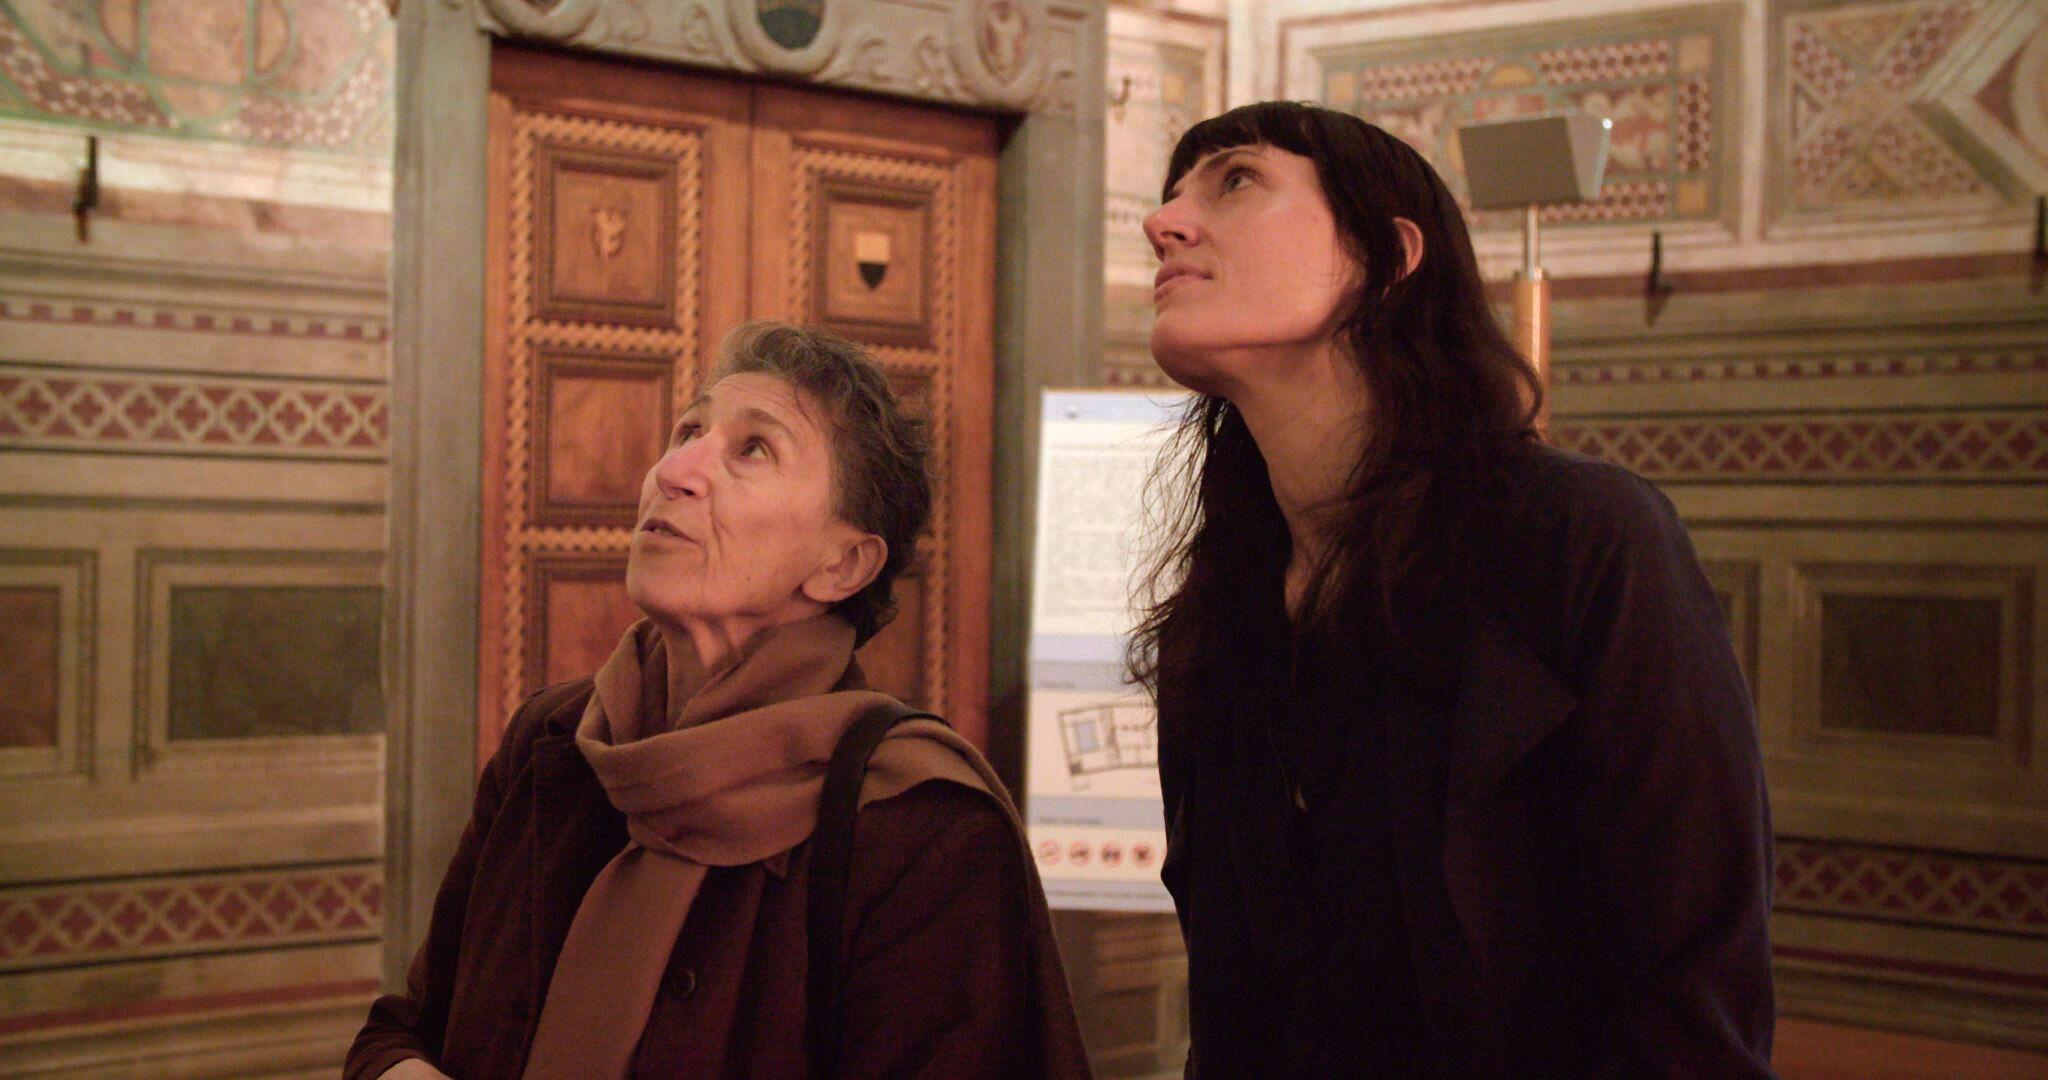 Sociologist Silvia Federici and filmmaker Astra Taylor